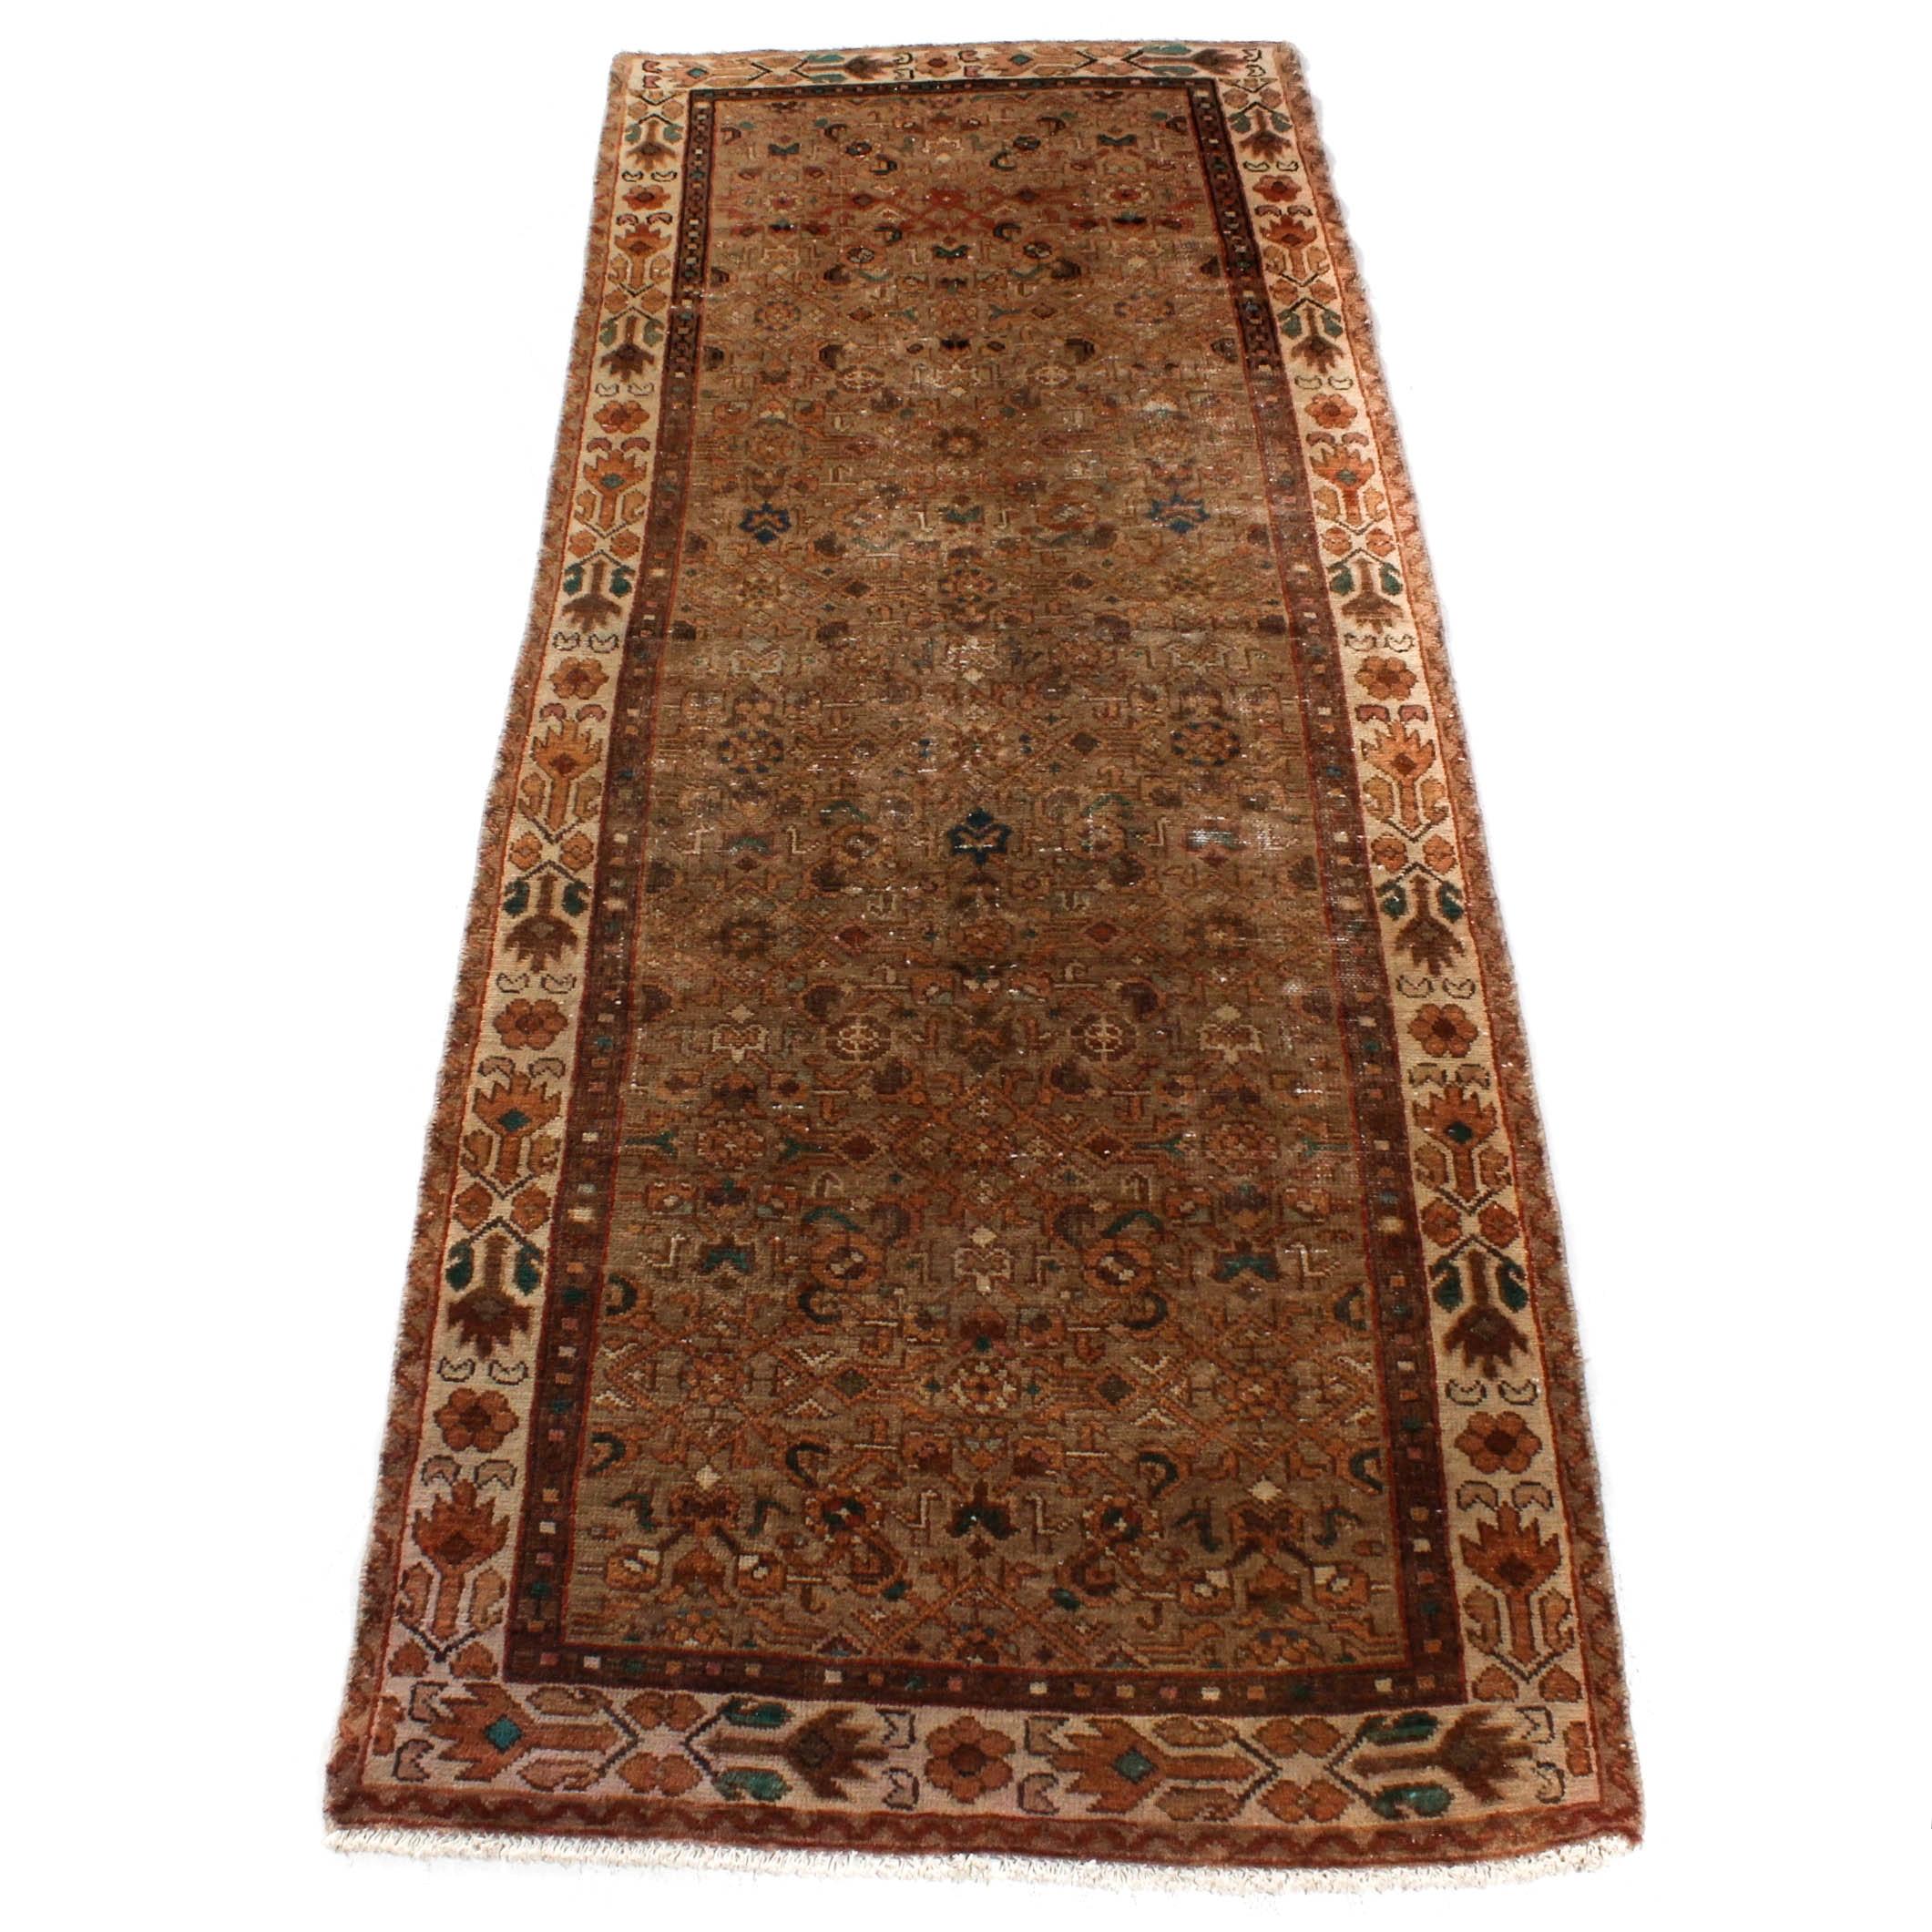 Vintage Hand-Knotted Persian Lilihan Sarouk Long Rug